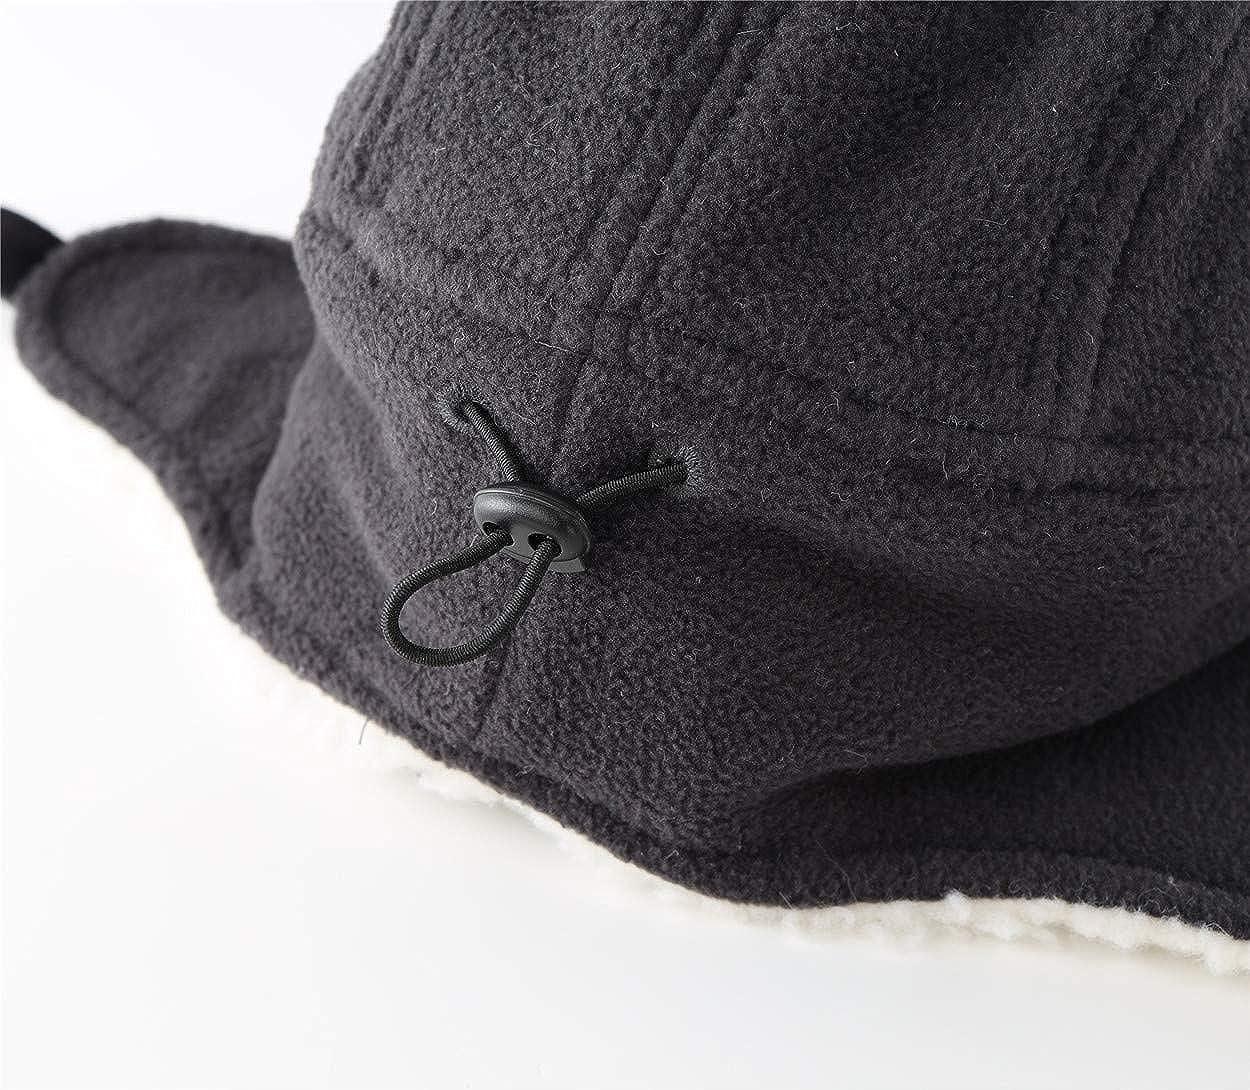 Magracy Toddler Boys Outdoor Windproof Winter Hat with Viosr Kids Warm Fleece Earflap Hats